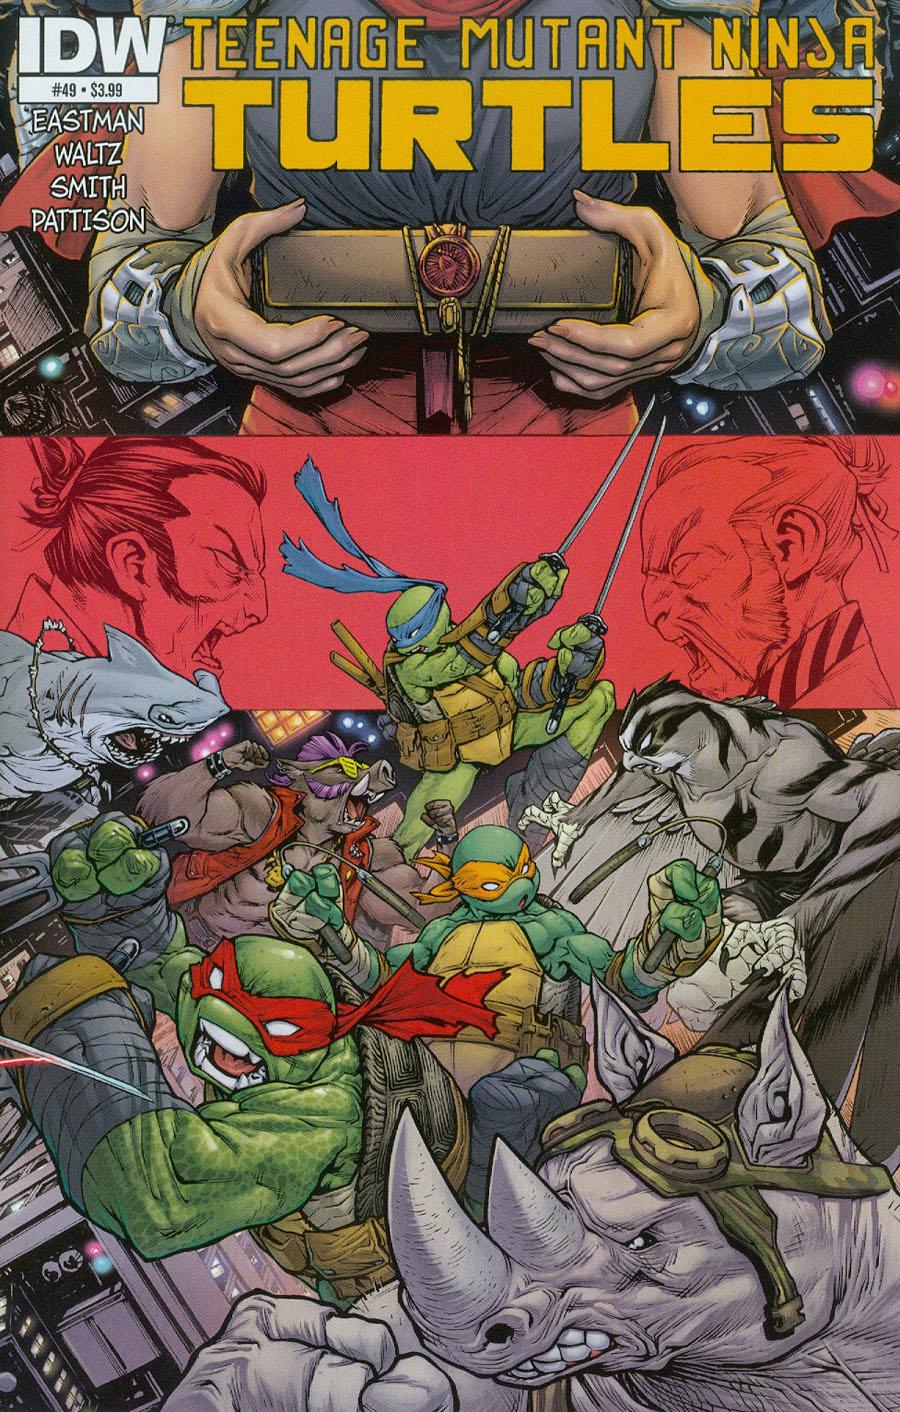 Teenage Mutant Ninja Turtles Vol 5 #49 Cover A Regular Mateus Santolouco Cover